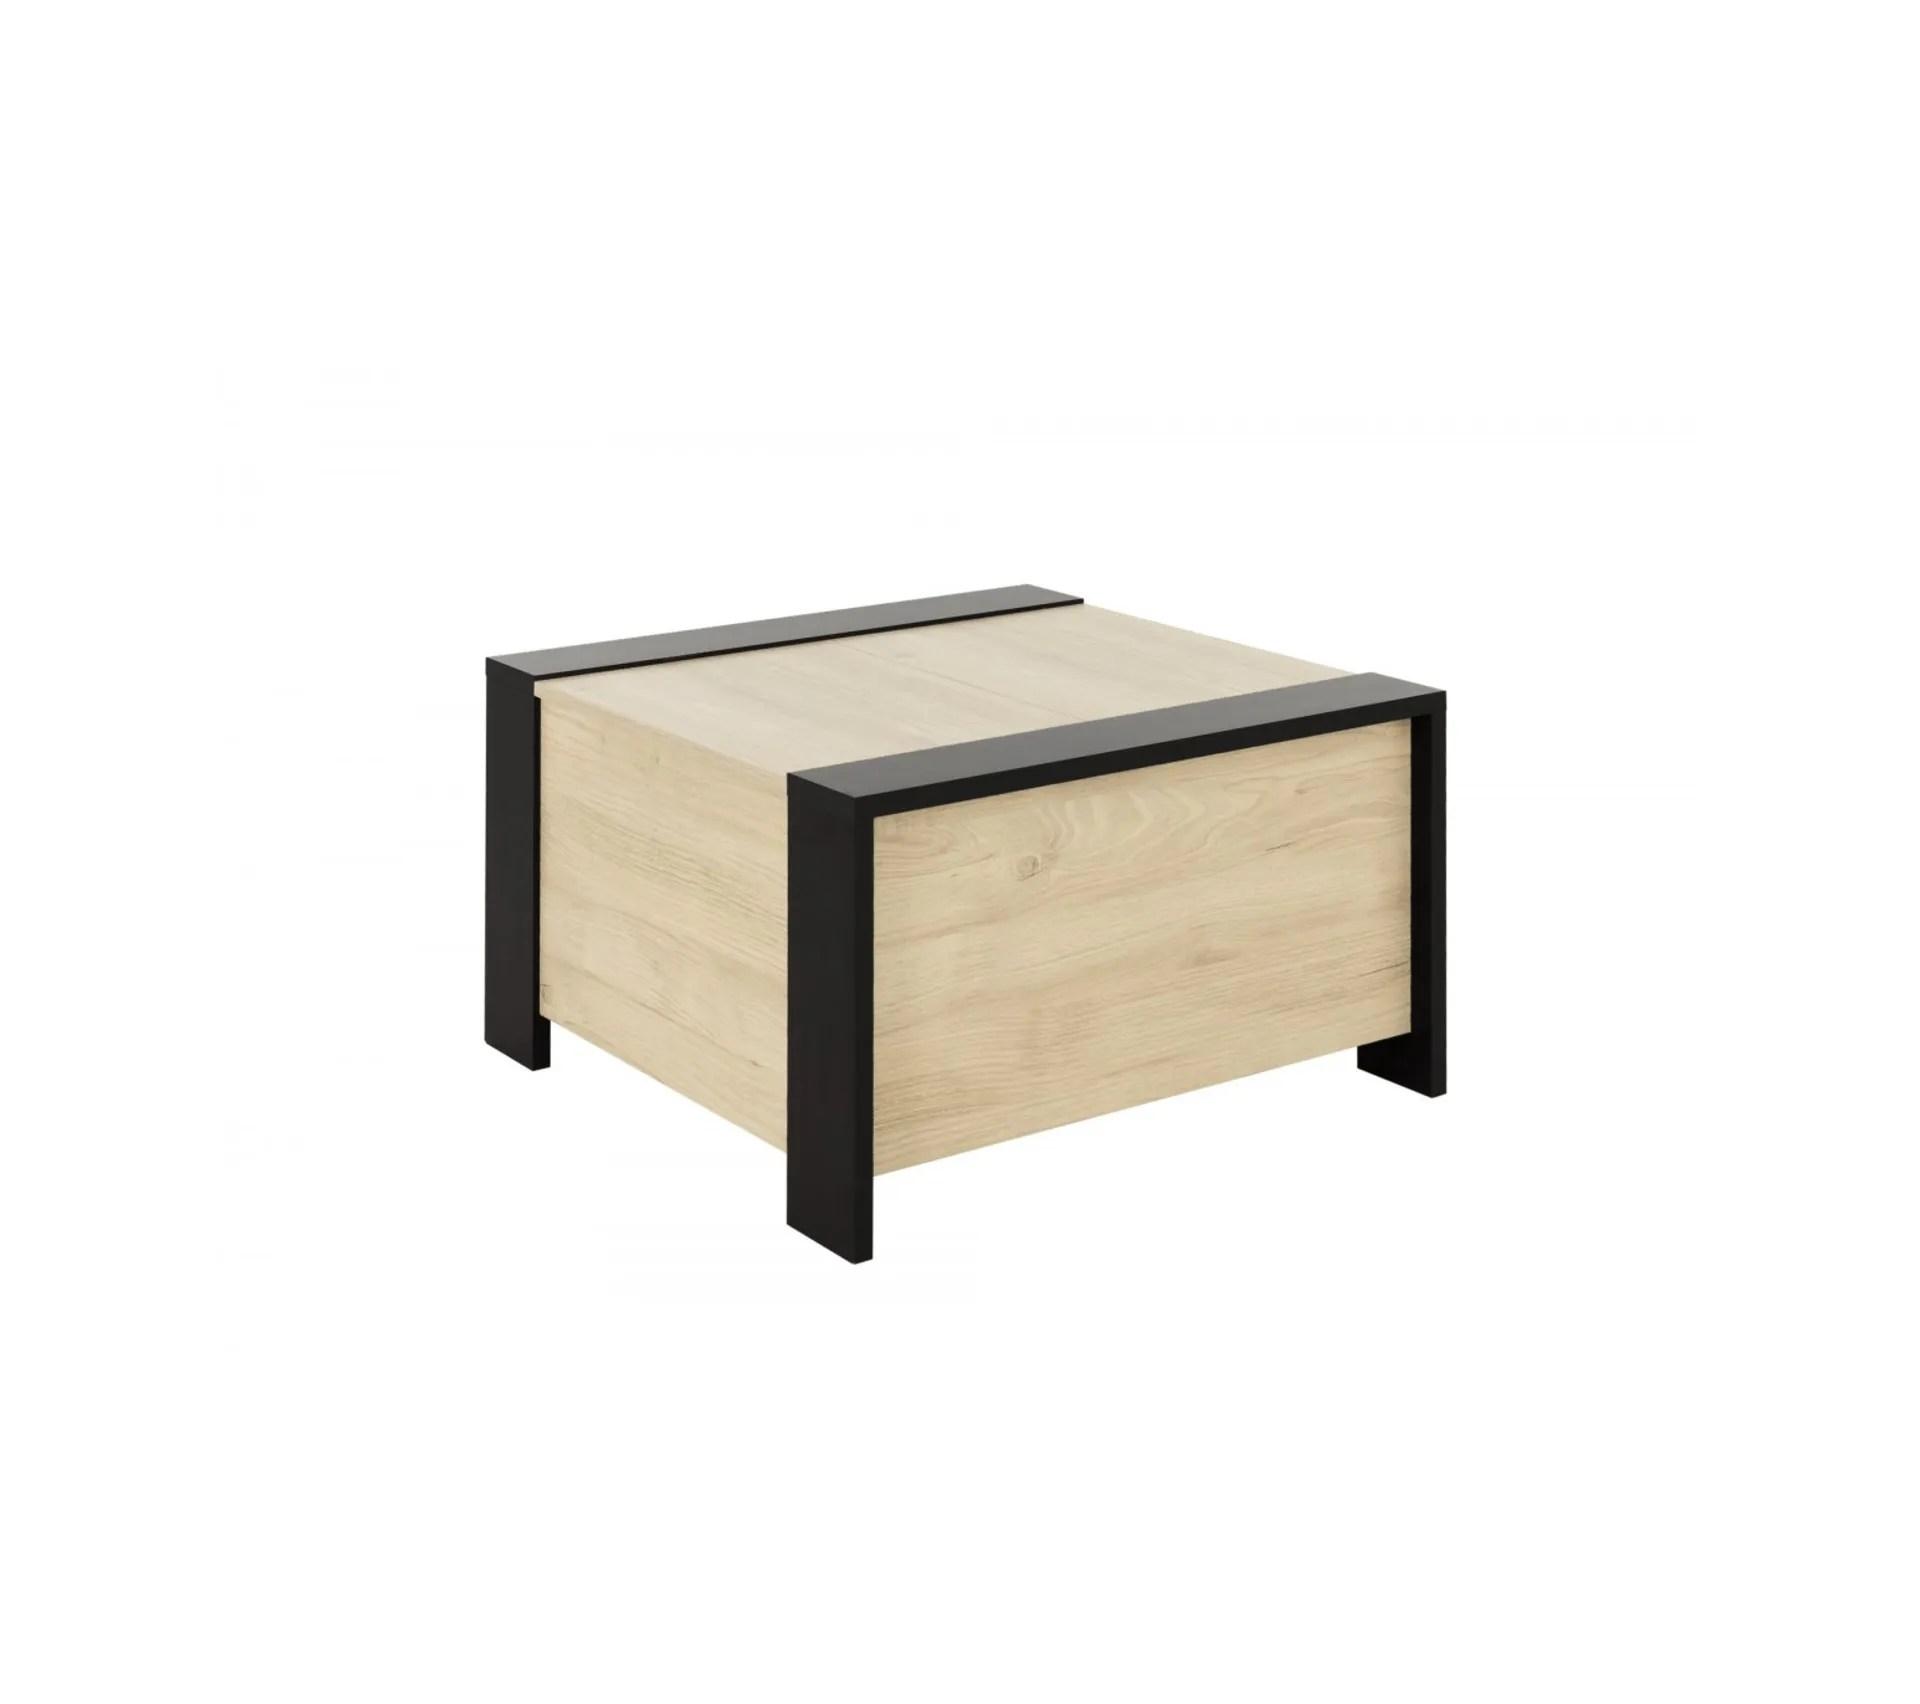 table basse avec rangement bar aurora fabrication francaise